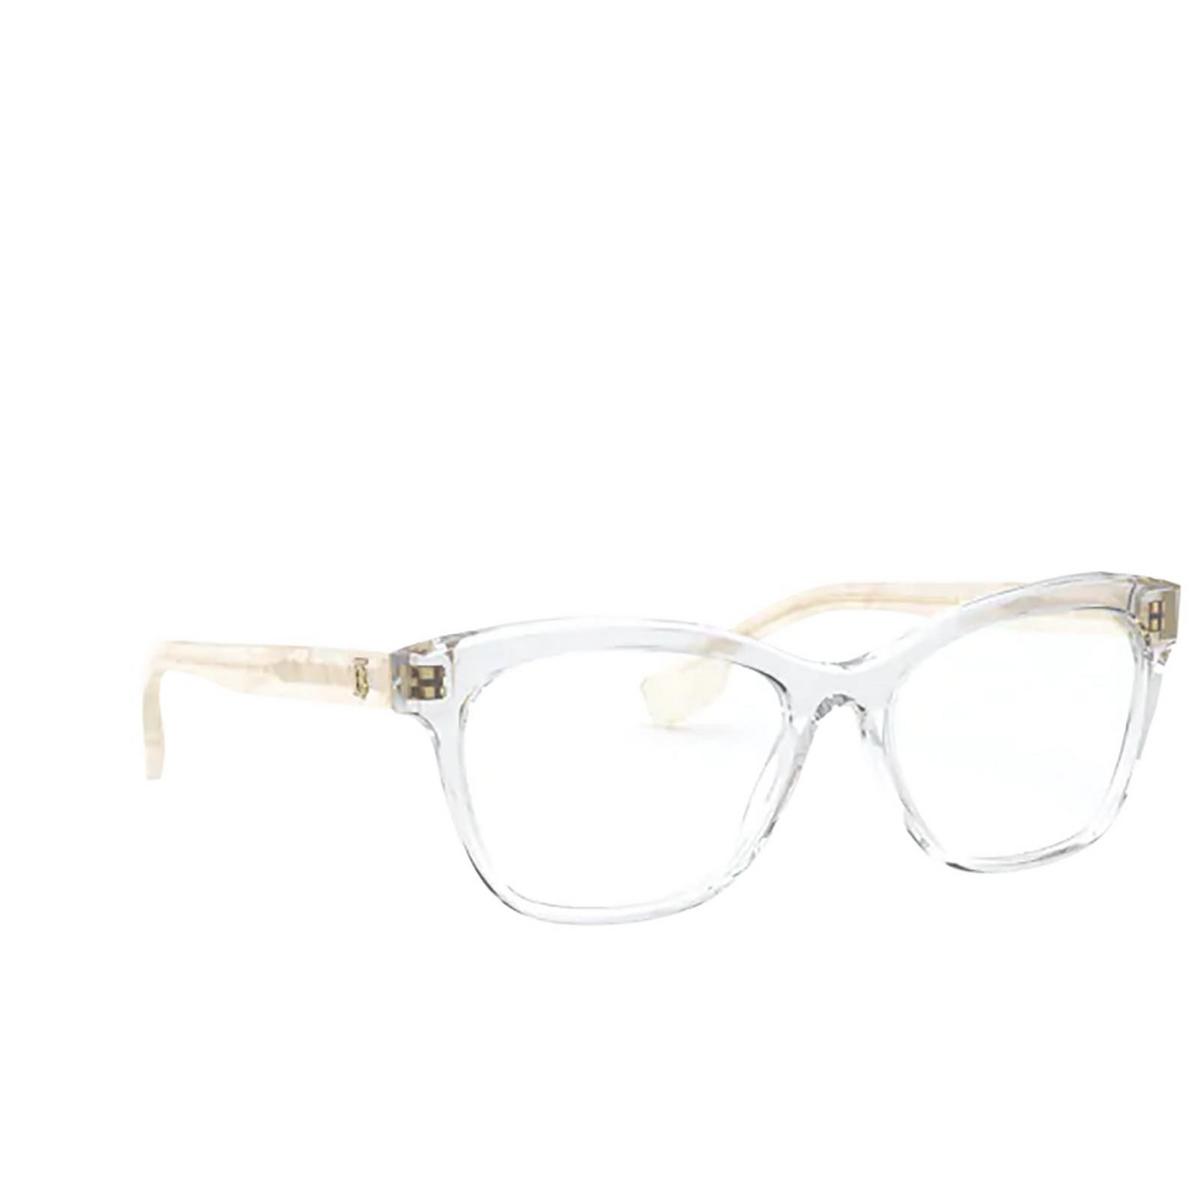 Burberry® Square Eyeglasses: Mildred BE2323 color Transparent 3896 - three-quarters view.